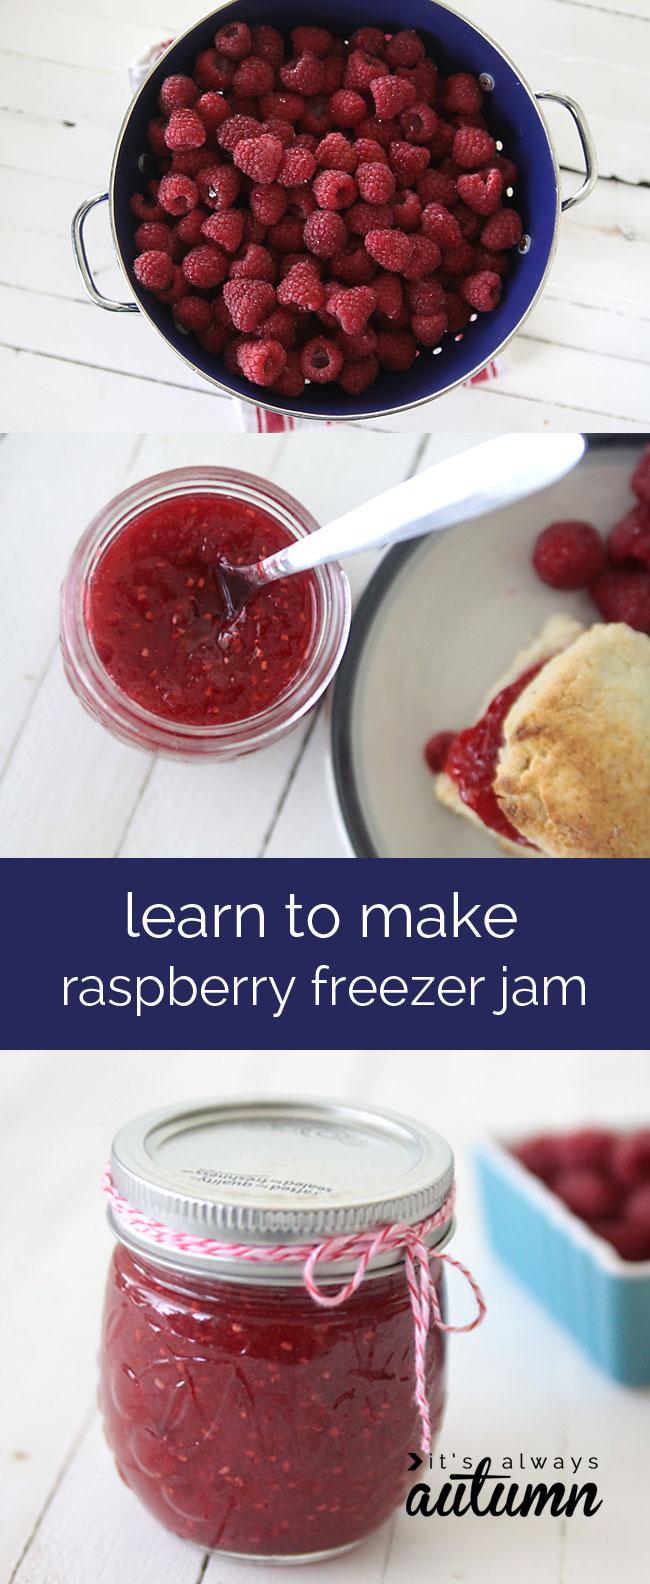 learn how to make easy homemade raspberry freezer jam